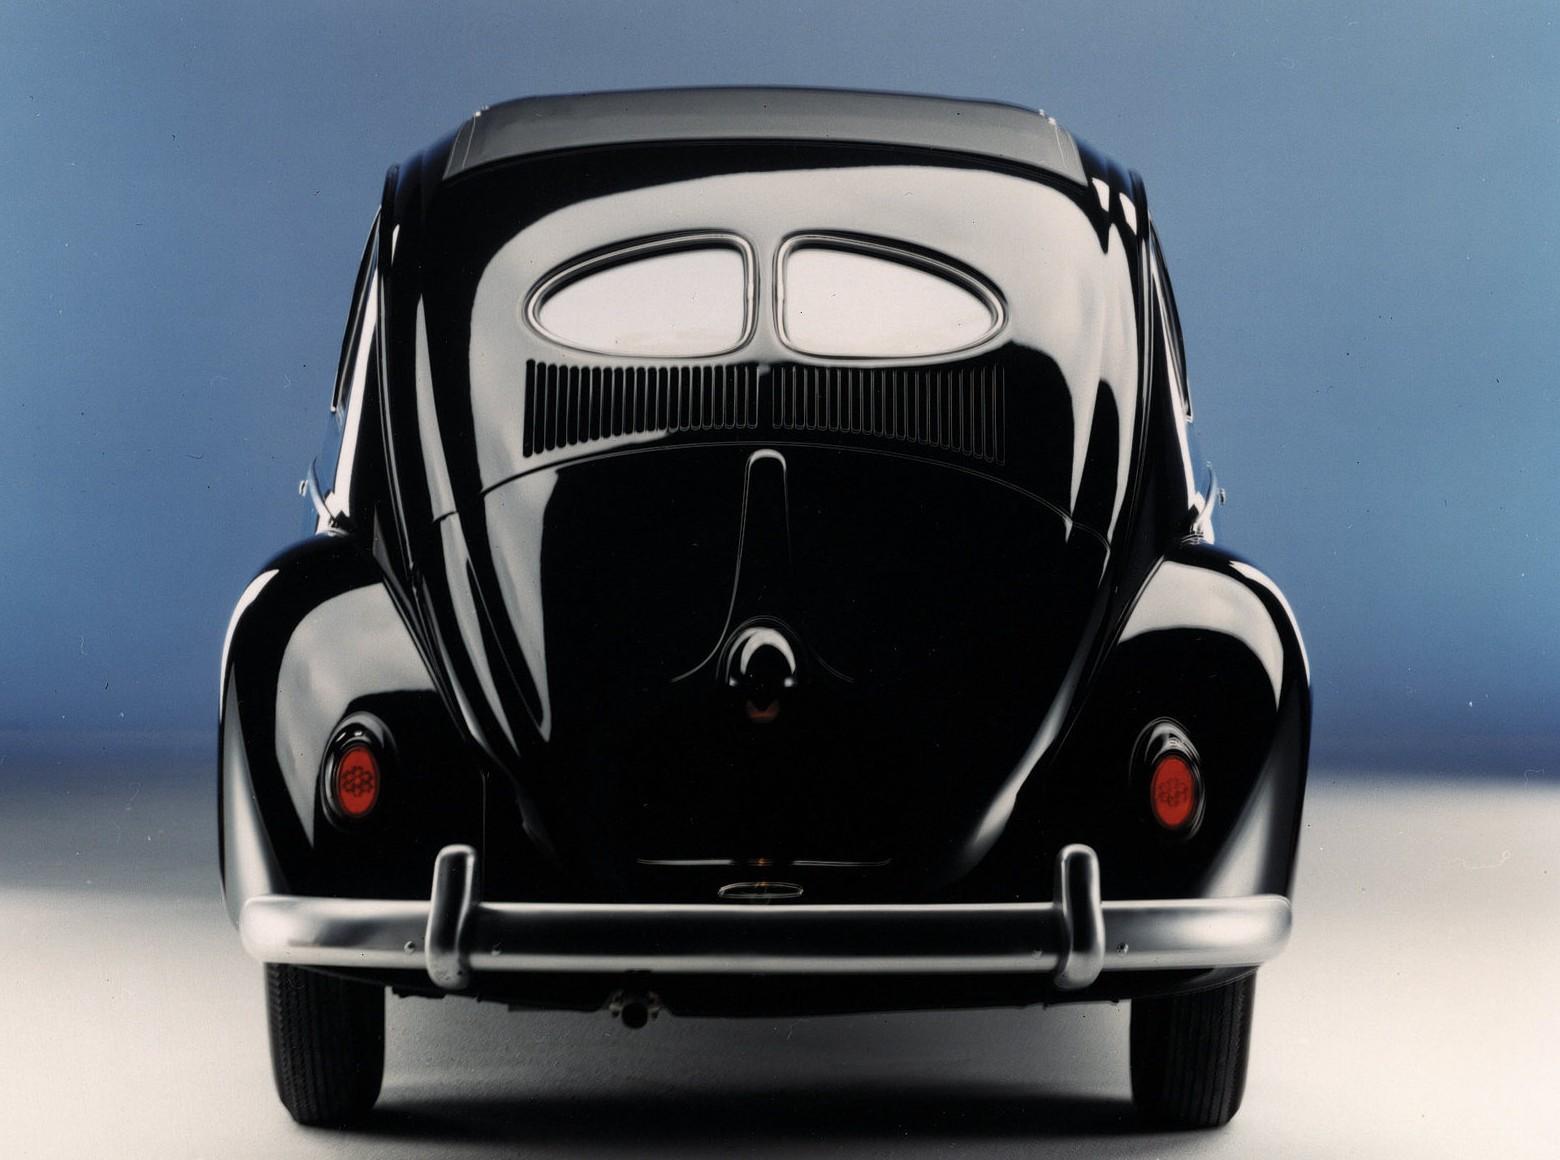 http://3.bp.blogspot.com/-2-Xn7Tpf8tY/UVgjkV8zXzI/AAAAAAAACK8/ZbTLV-_o1Ek/s1600/Volkswagen-Beetle_1938_1600x1200_wallpaper_16.jpg